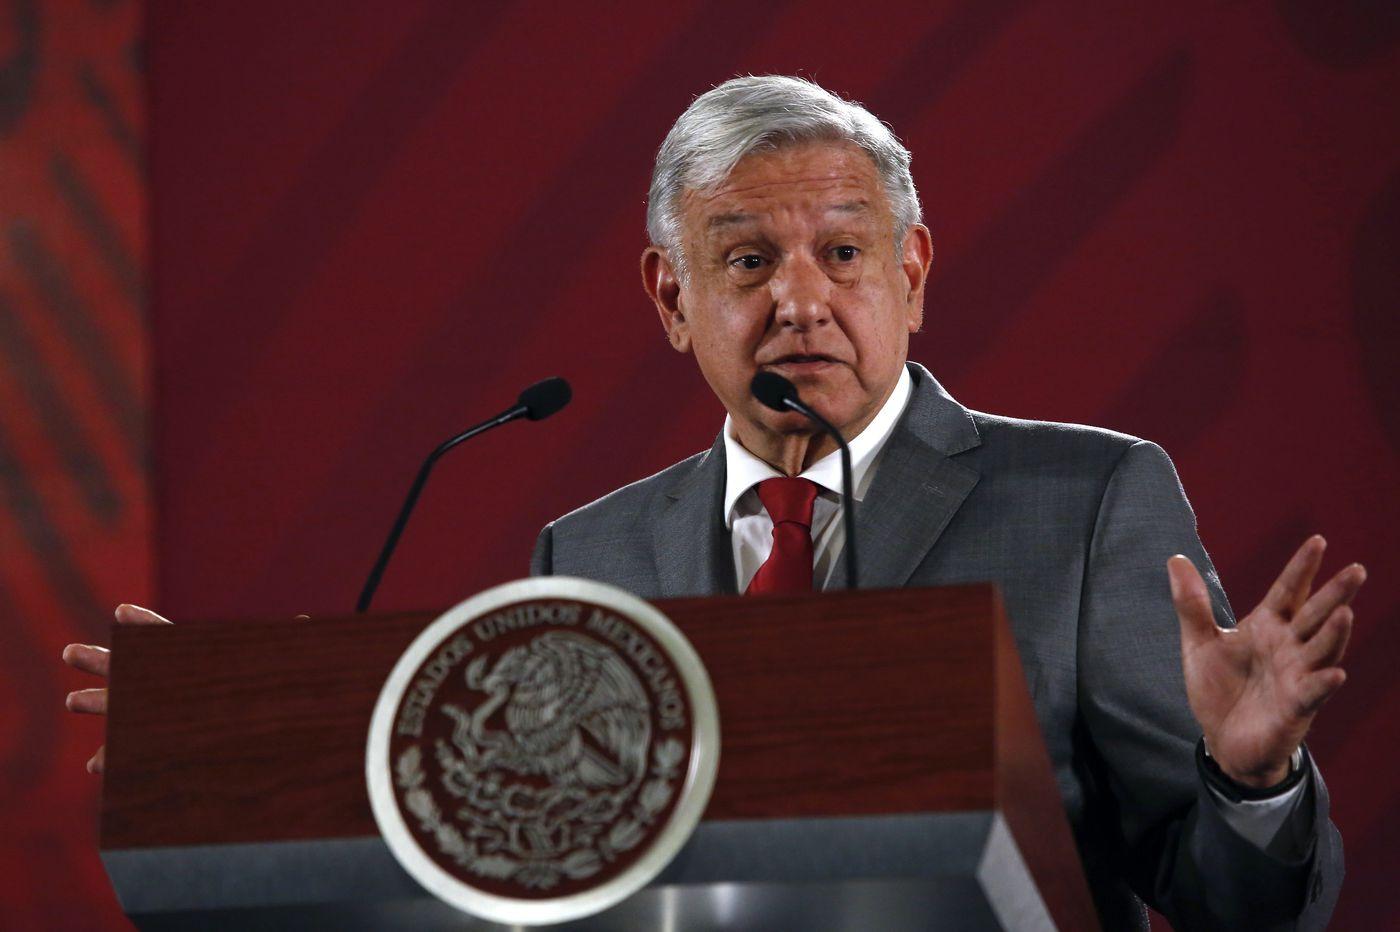 Trump tariff threats alarm Mexico growers, economists